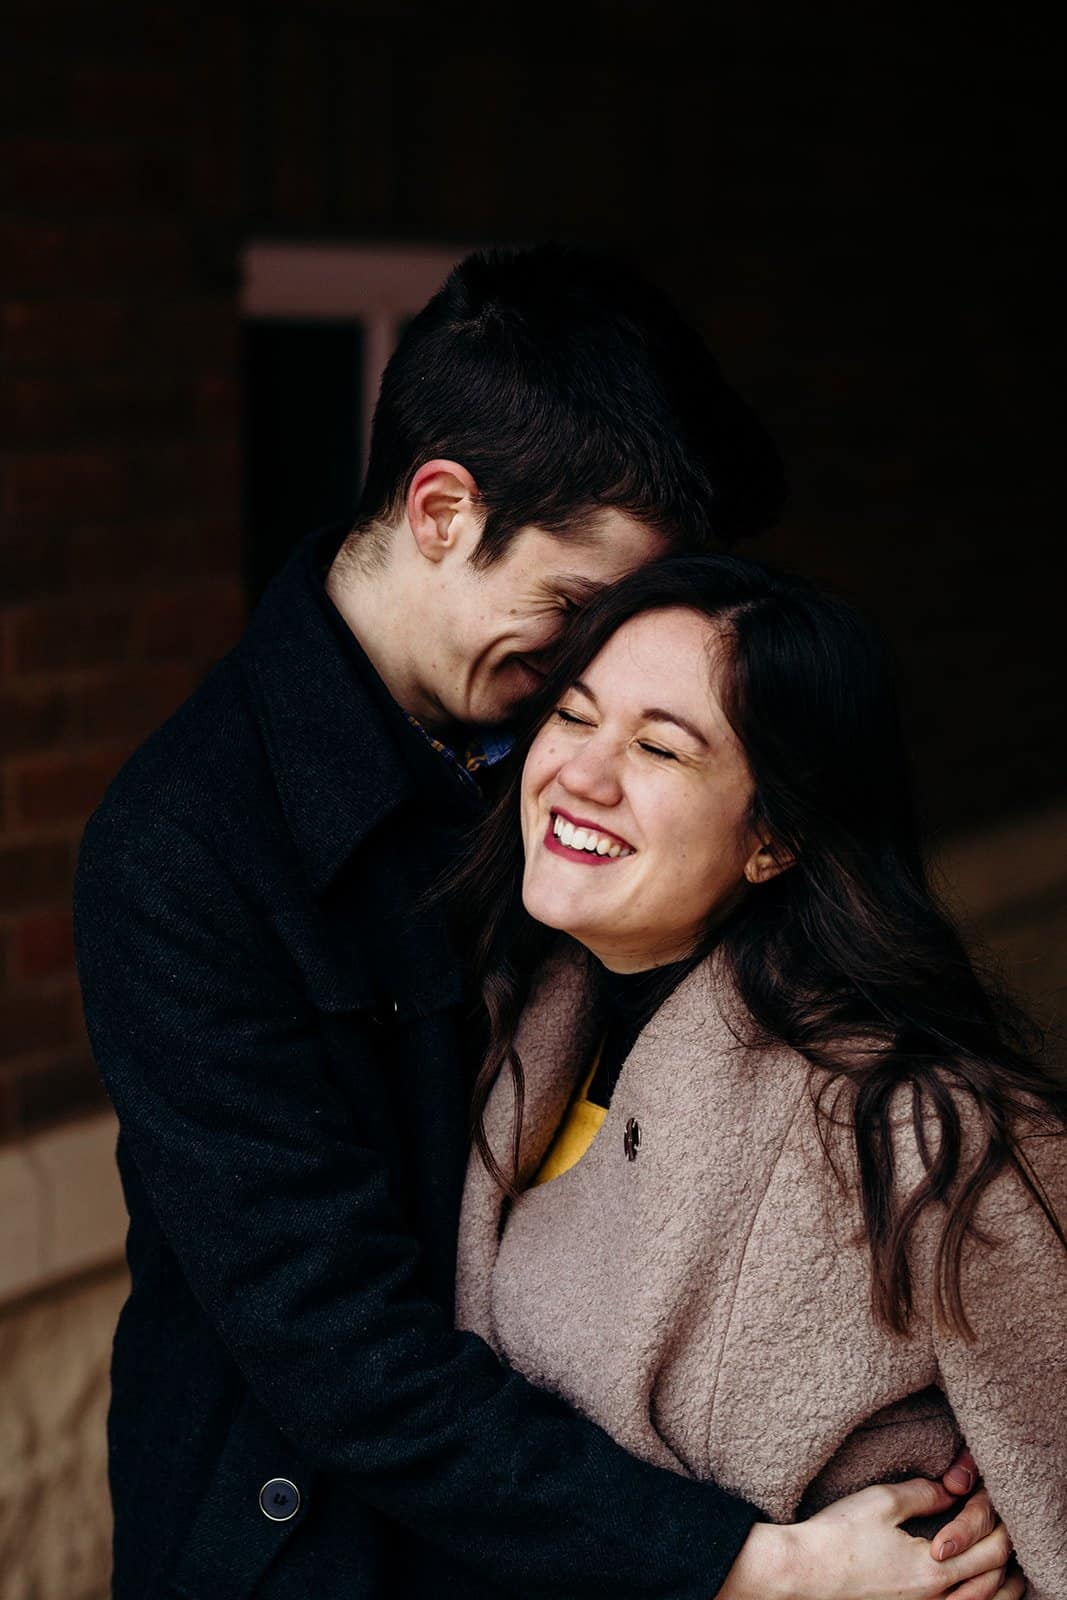 Kent ohio engaged couple laughing in doorway